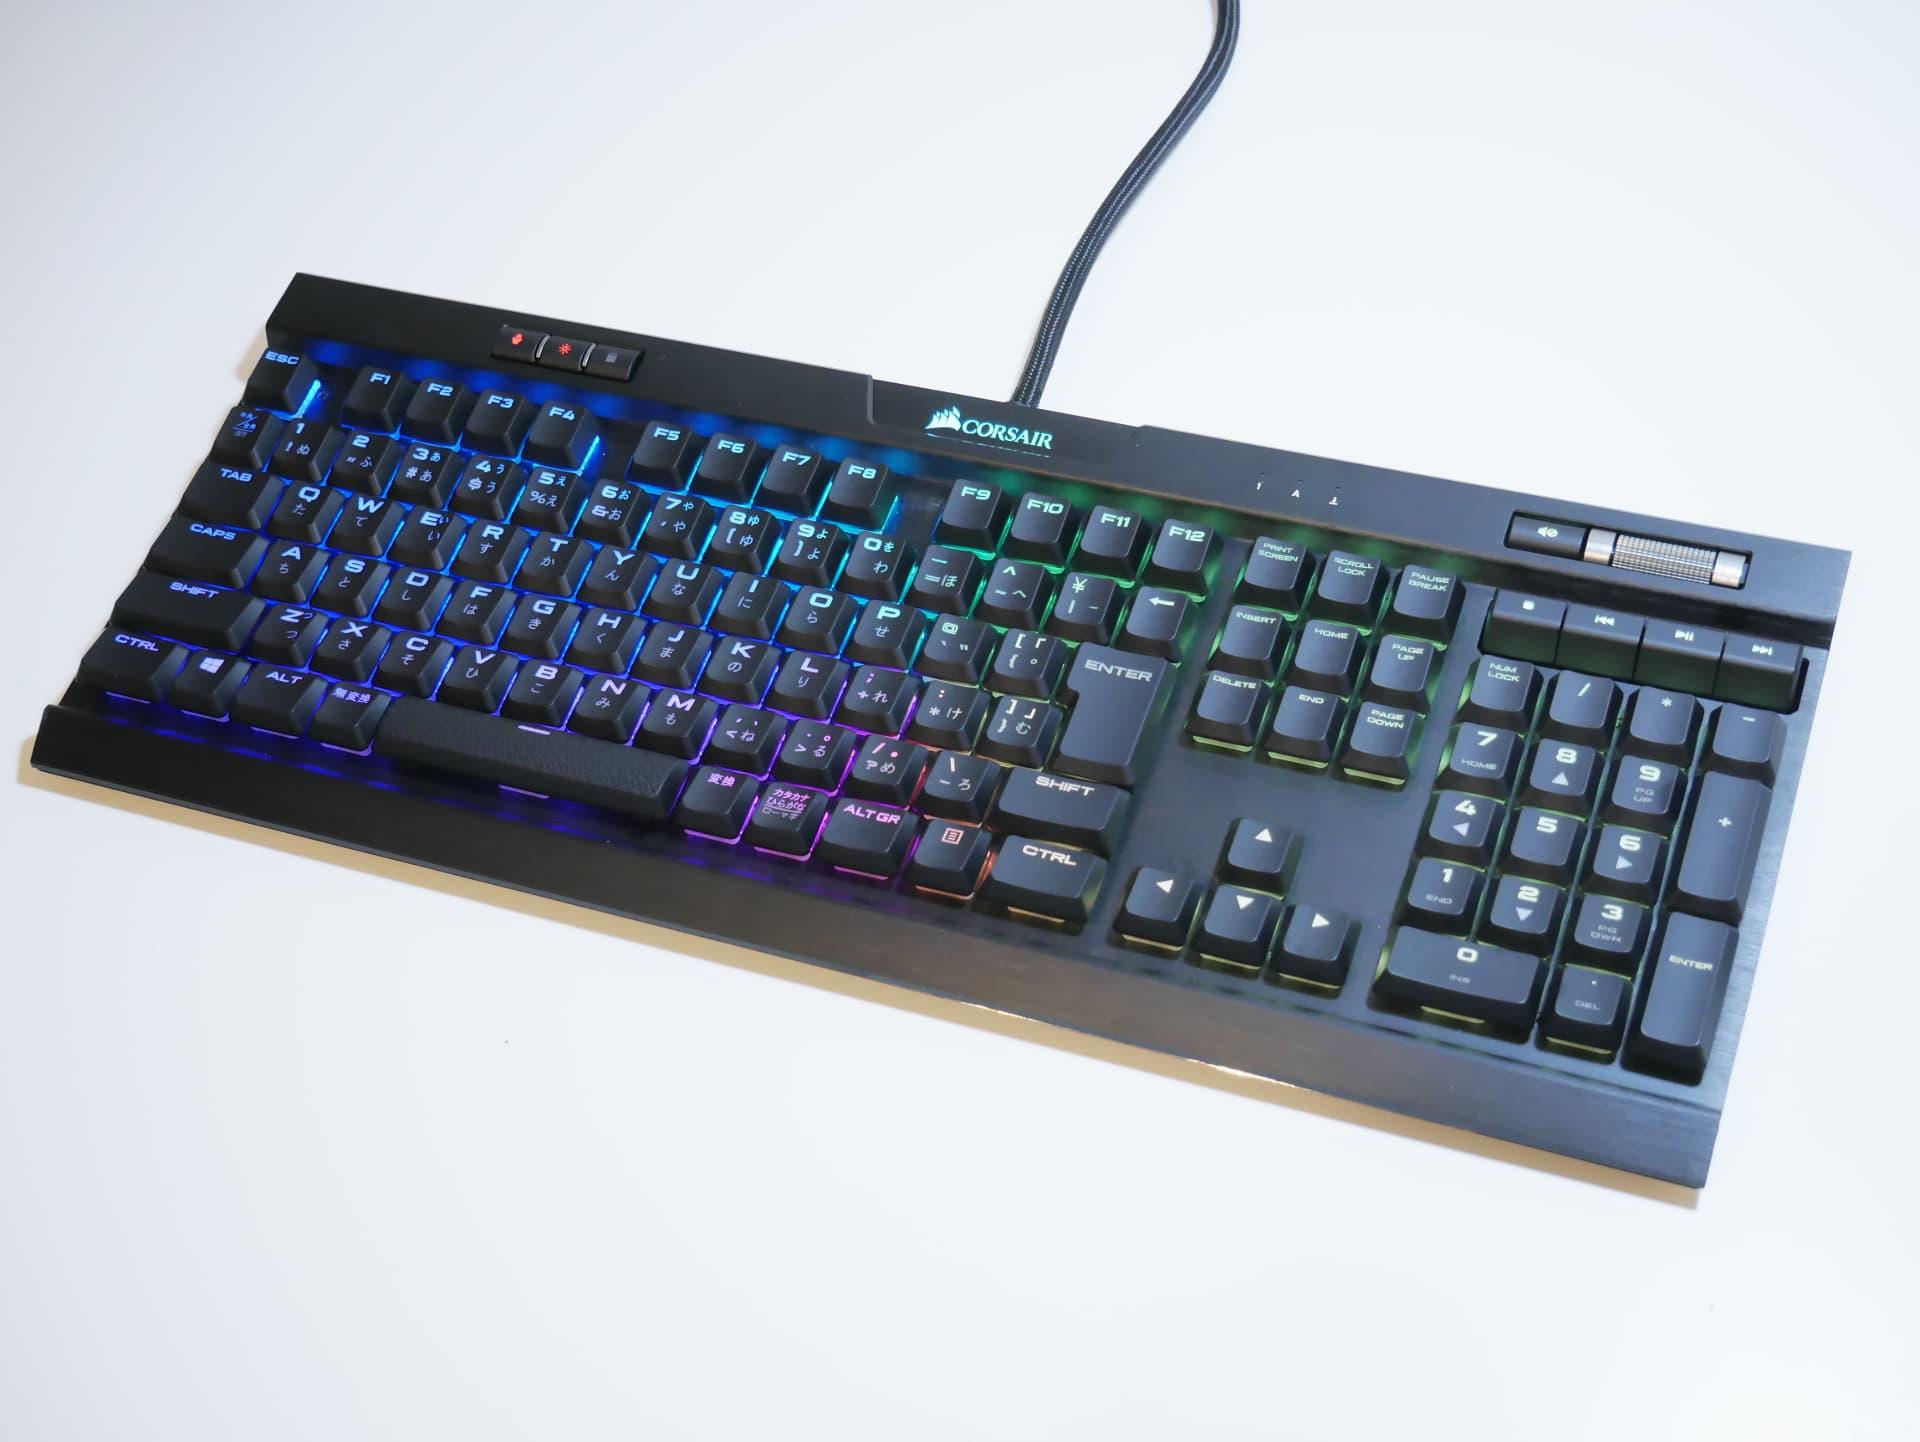 「Corsair K70 RGB MK.2 Low Profile」レビュー。作動点1.0mmのロープロファイル銀軸を備える薄型ゲーミングキーボード